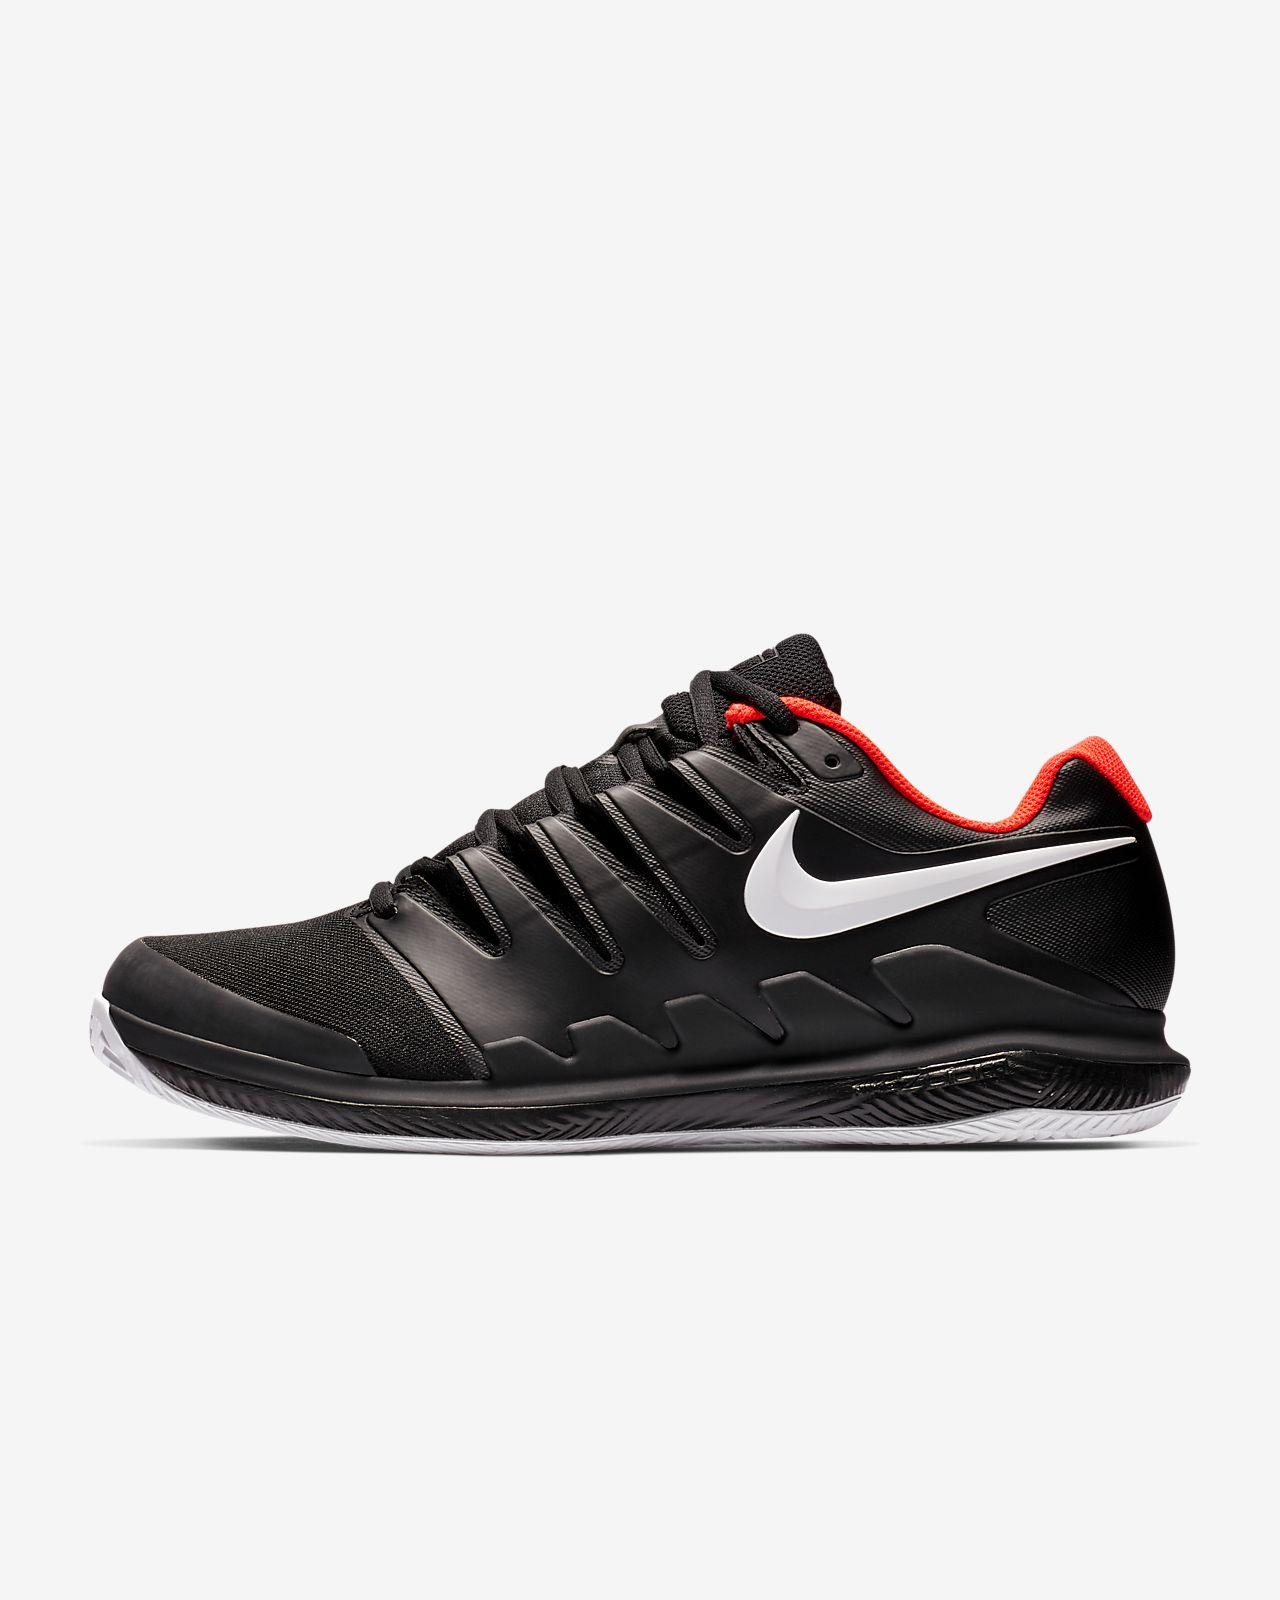 8062a08a70a43 Nike Air Zoom Vapor X Clay Zapatillas de tenis - Hombre. Nike.com ES